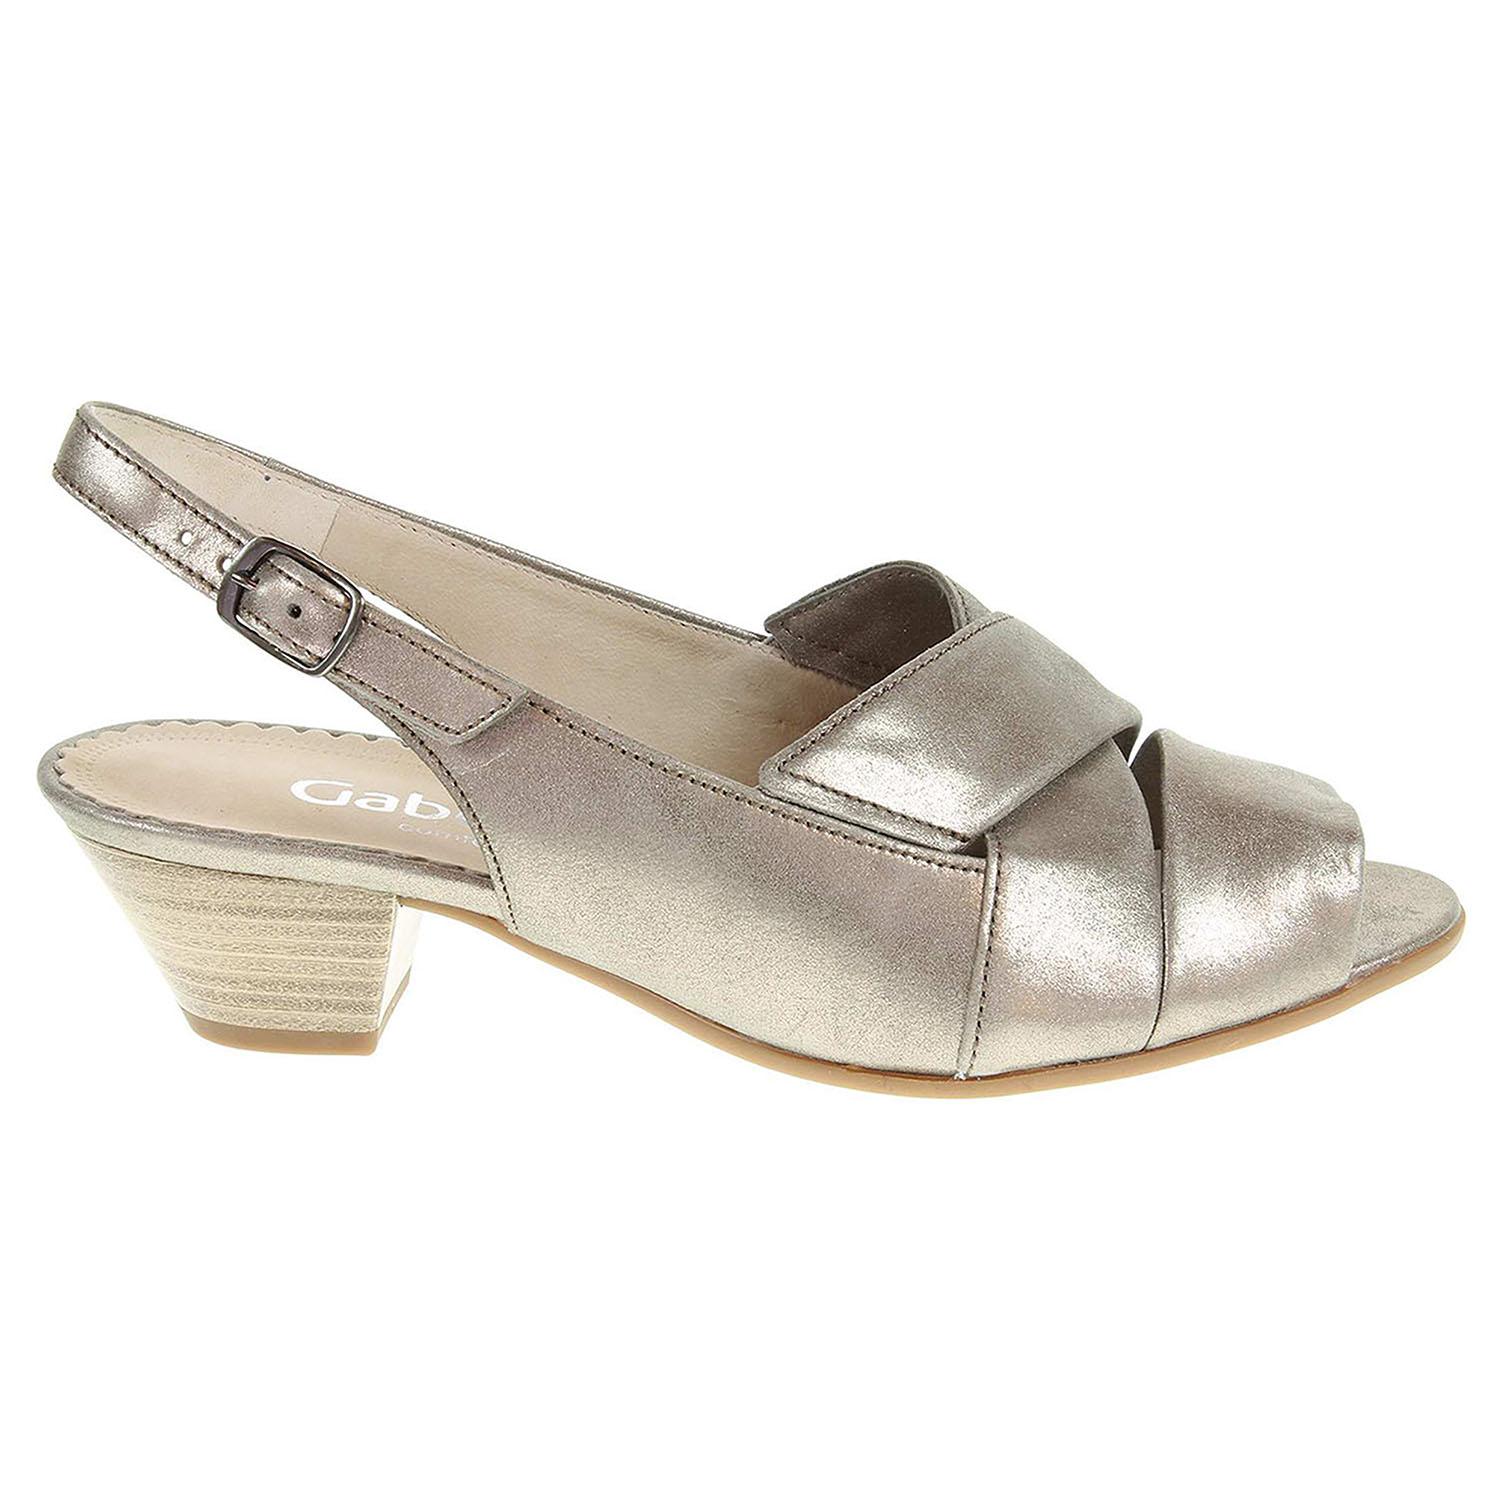 Ecco Gabor dámské sandály 66.571.62 zlaté 23801134